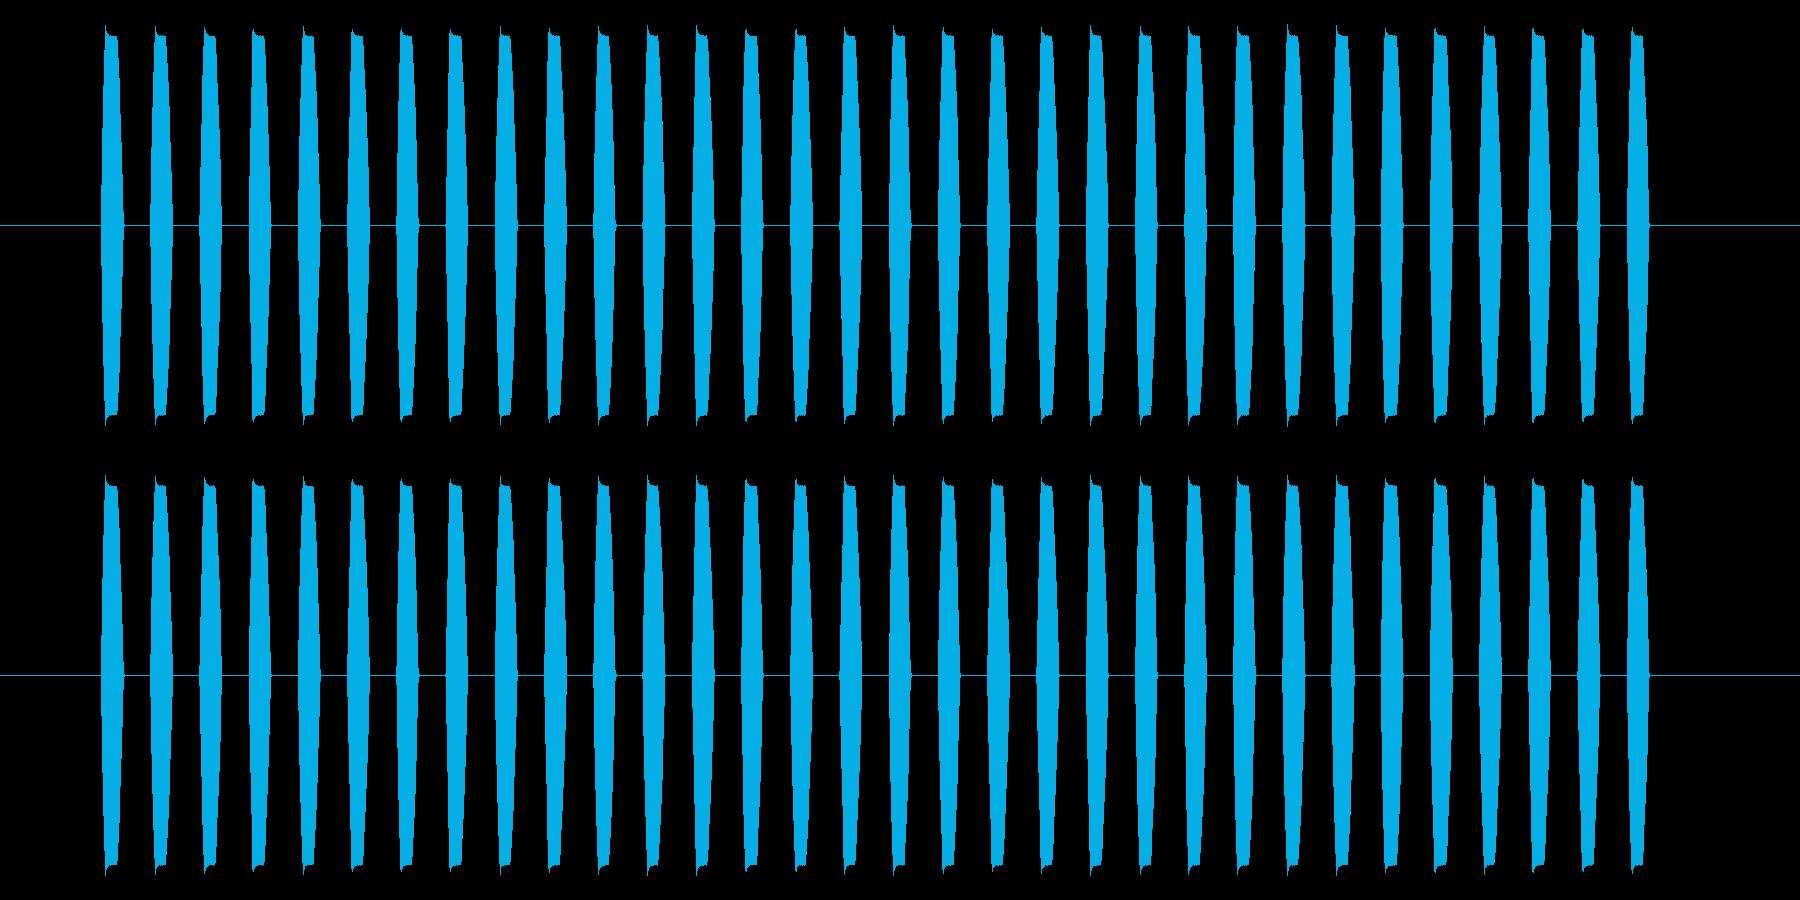 SNES-RPG01-09(メッセージ)の再生済みの波形